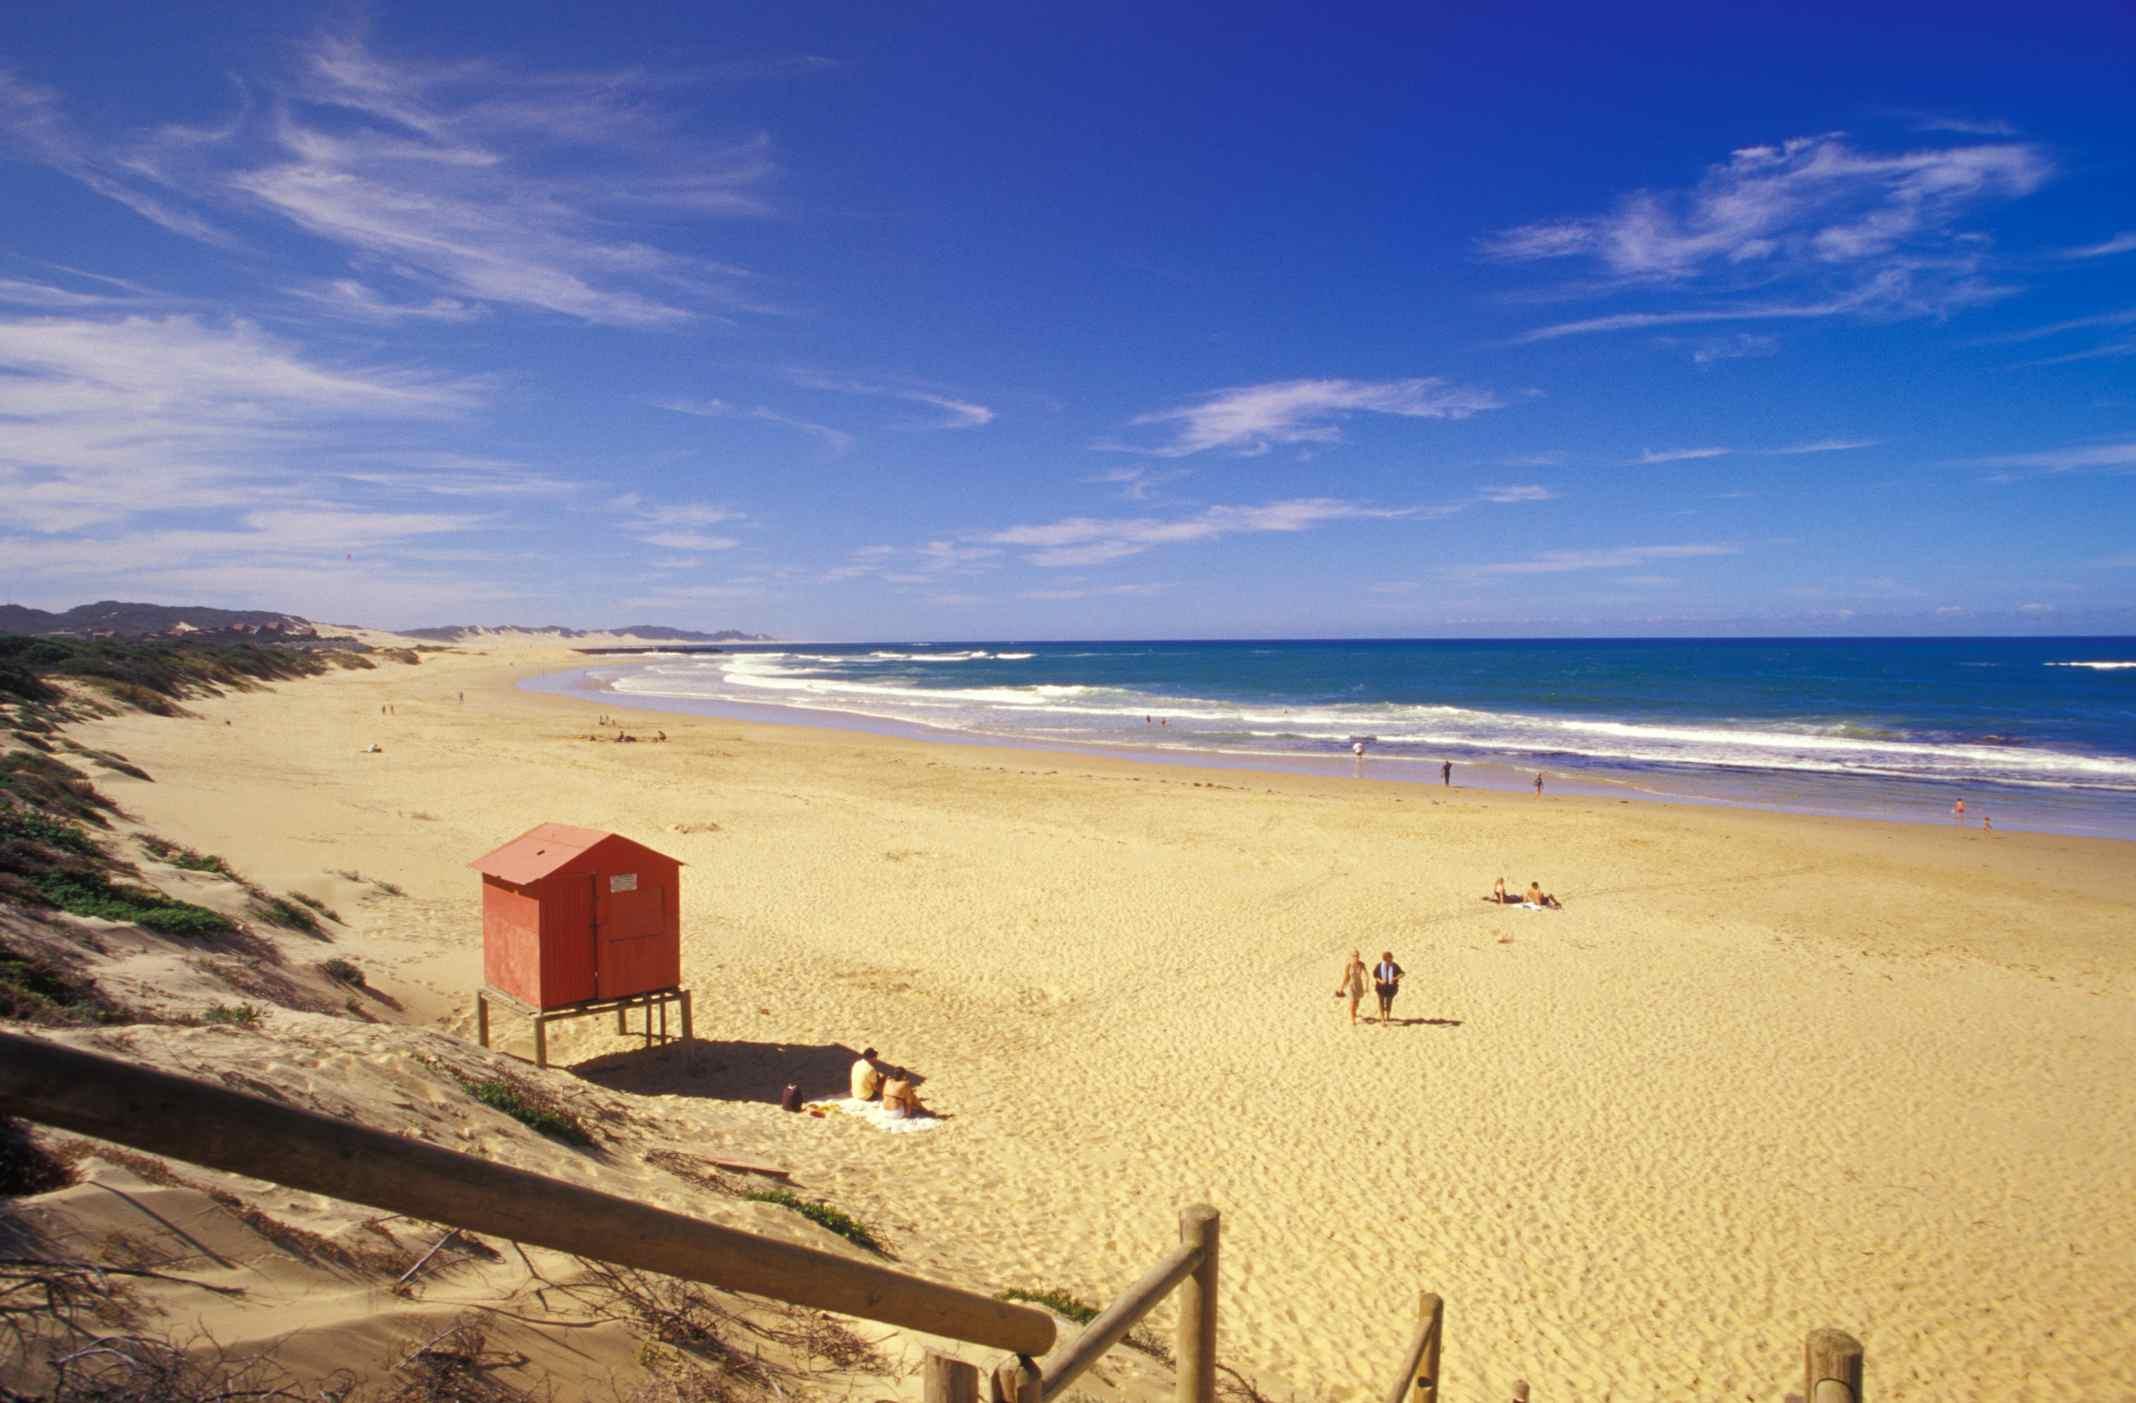 Kelly's Beach, Eastern Cape